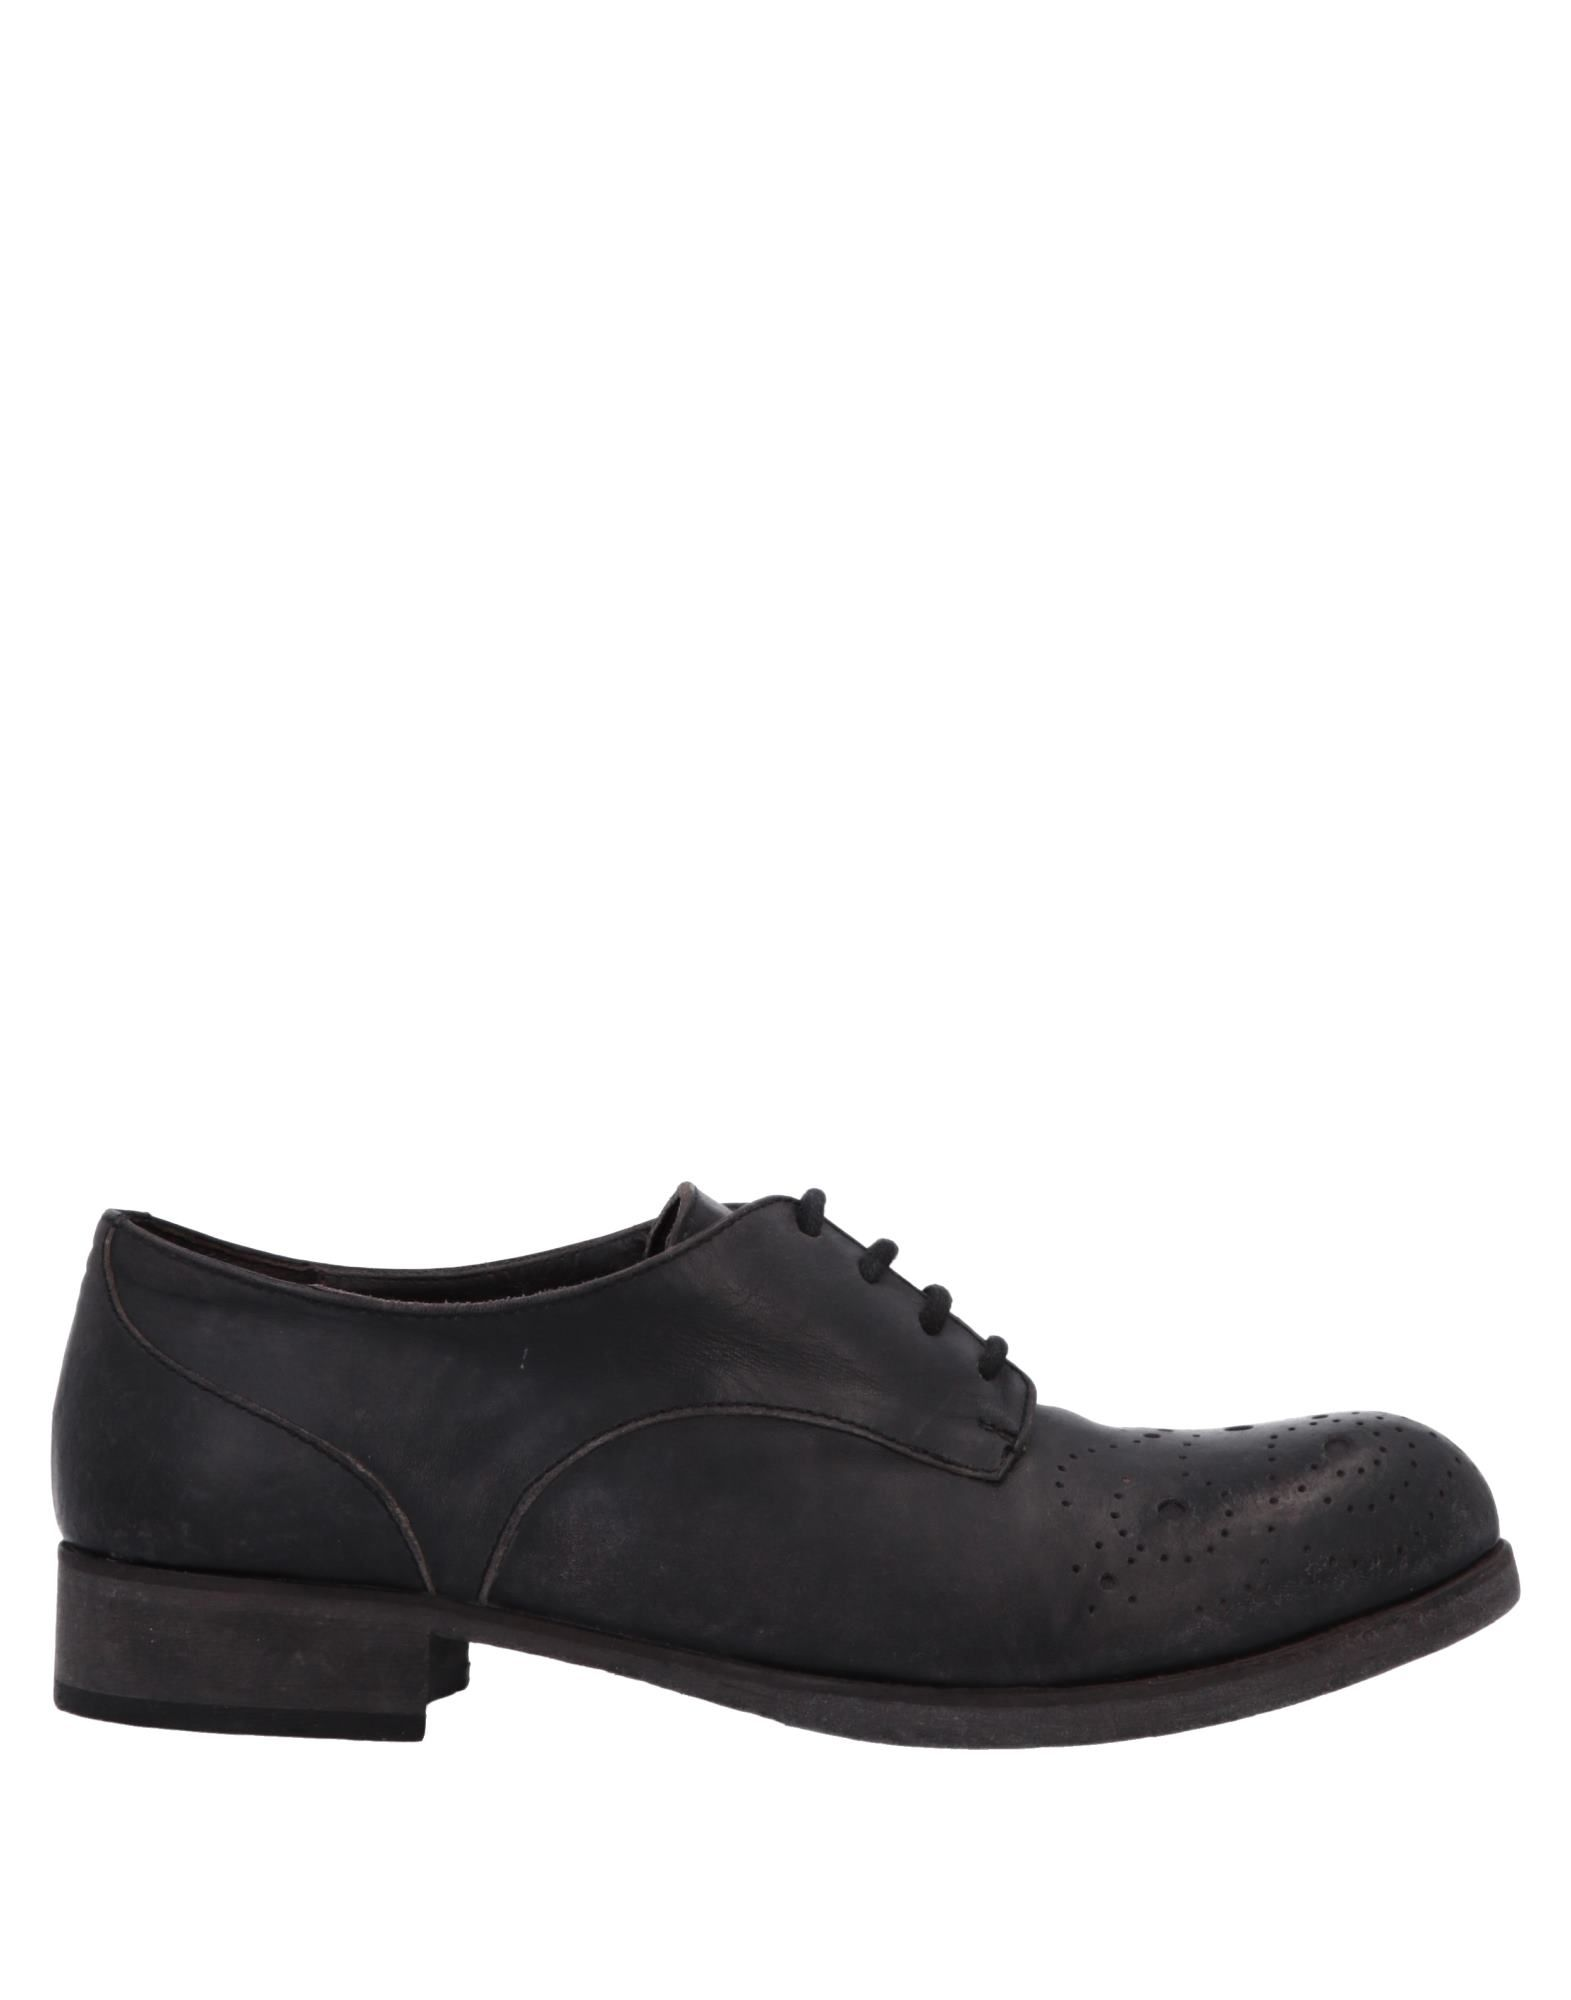 Фото - QSP+ QUELQUES SHOES DE PLUS Обувь на шнурках women high heel shoes platform pumps woman thin high heels party wedding shoes ladies kitten heels plus size 34 40 41 42 43